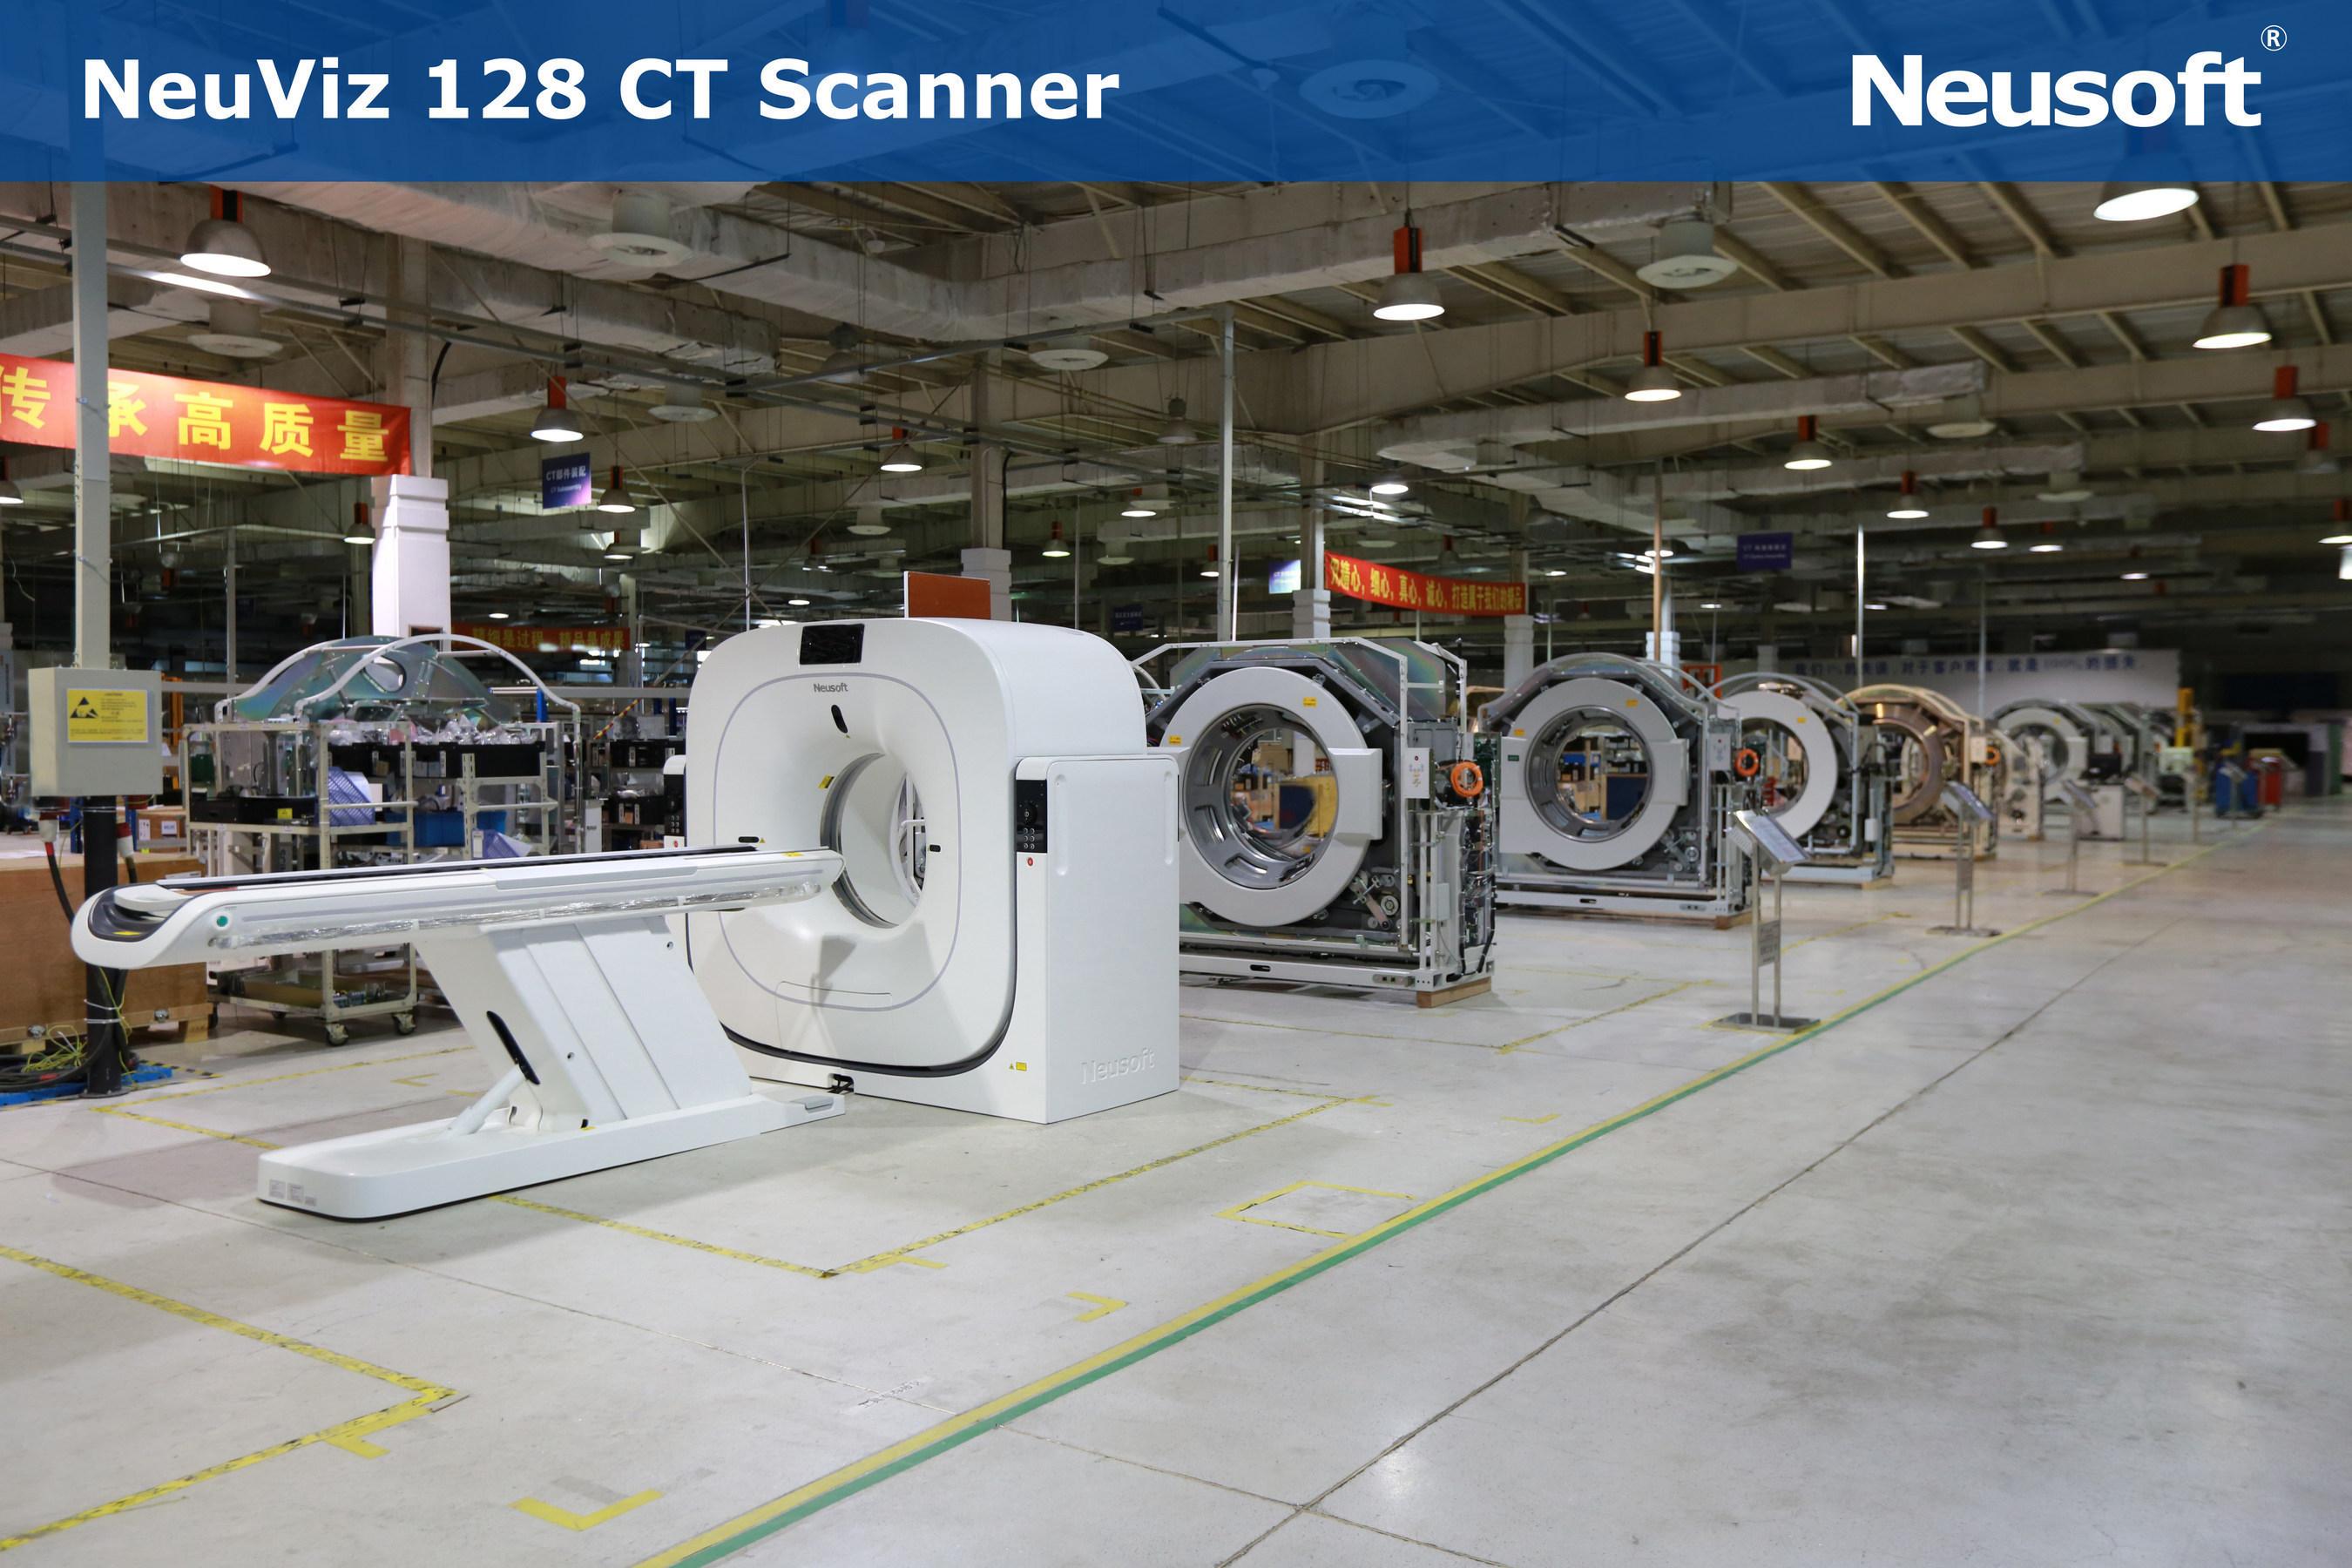 Neusoft lance le tomodensitogramme NeuViz 128 sur le marché international